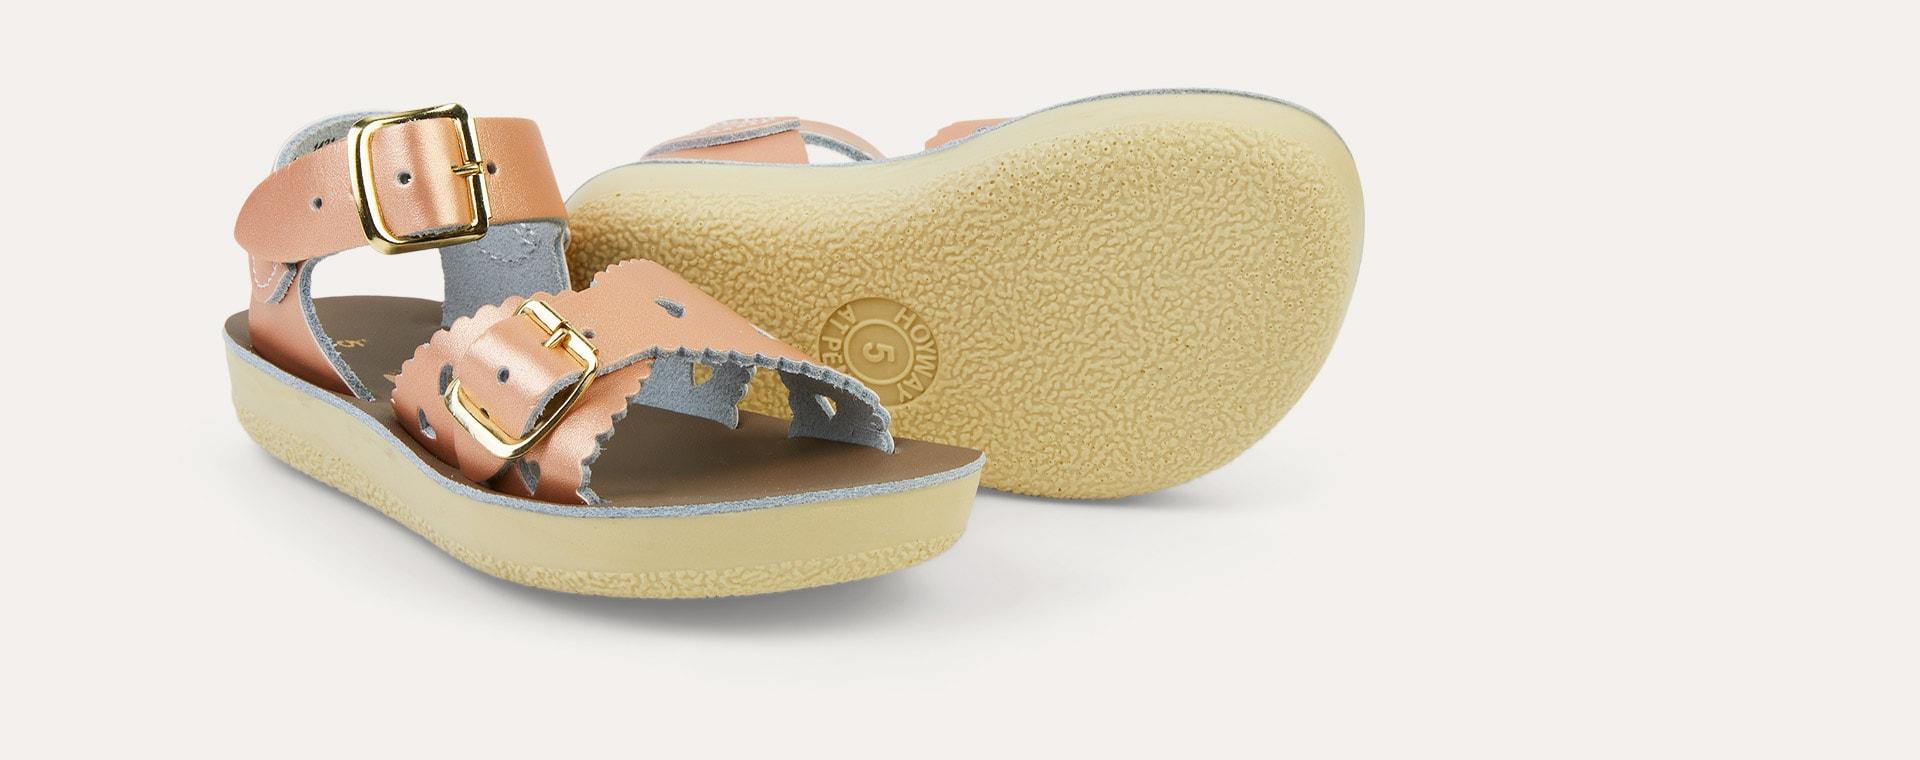 Rose Gold Salt-Water Sandals Sweetheart Sandal